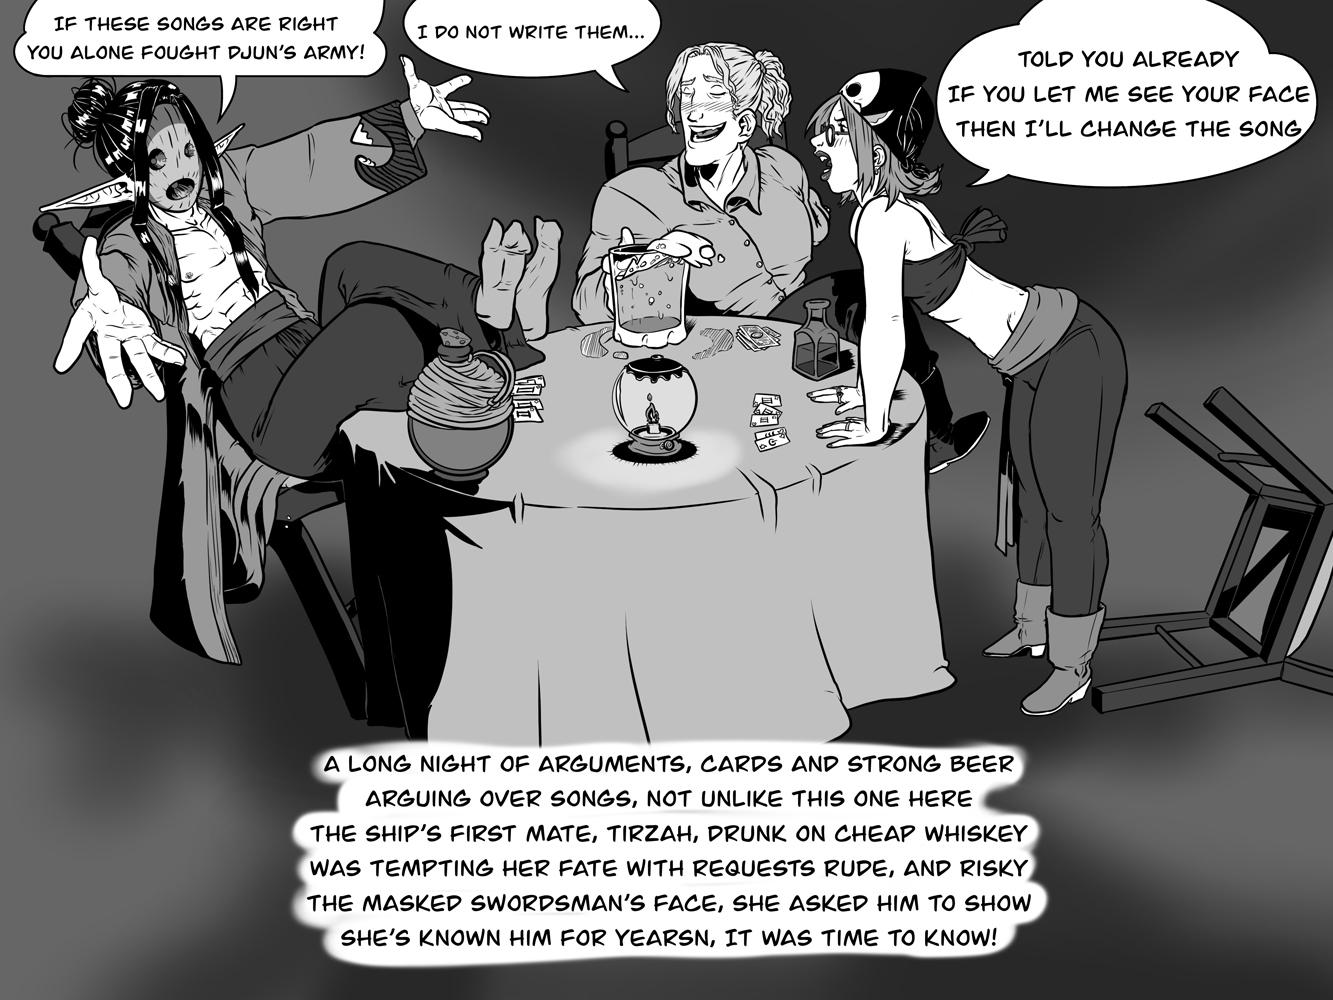 Drunken arguments